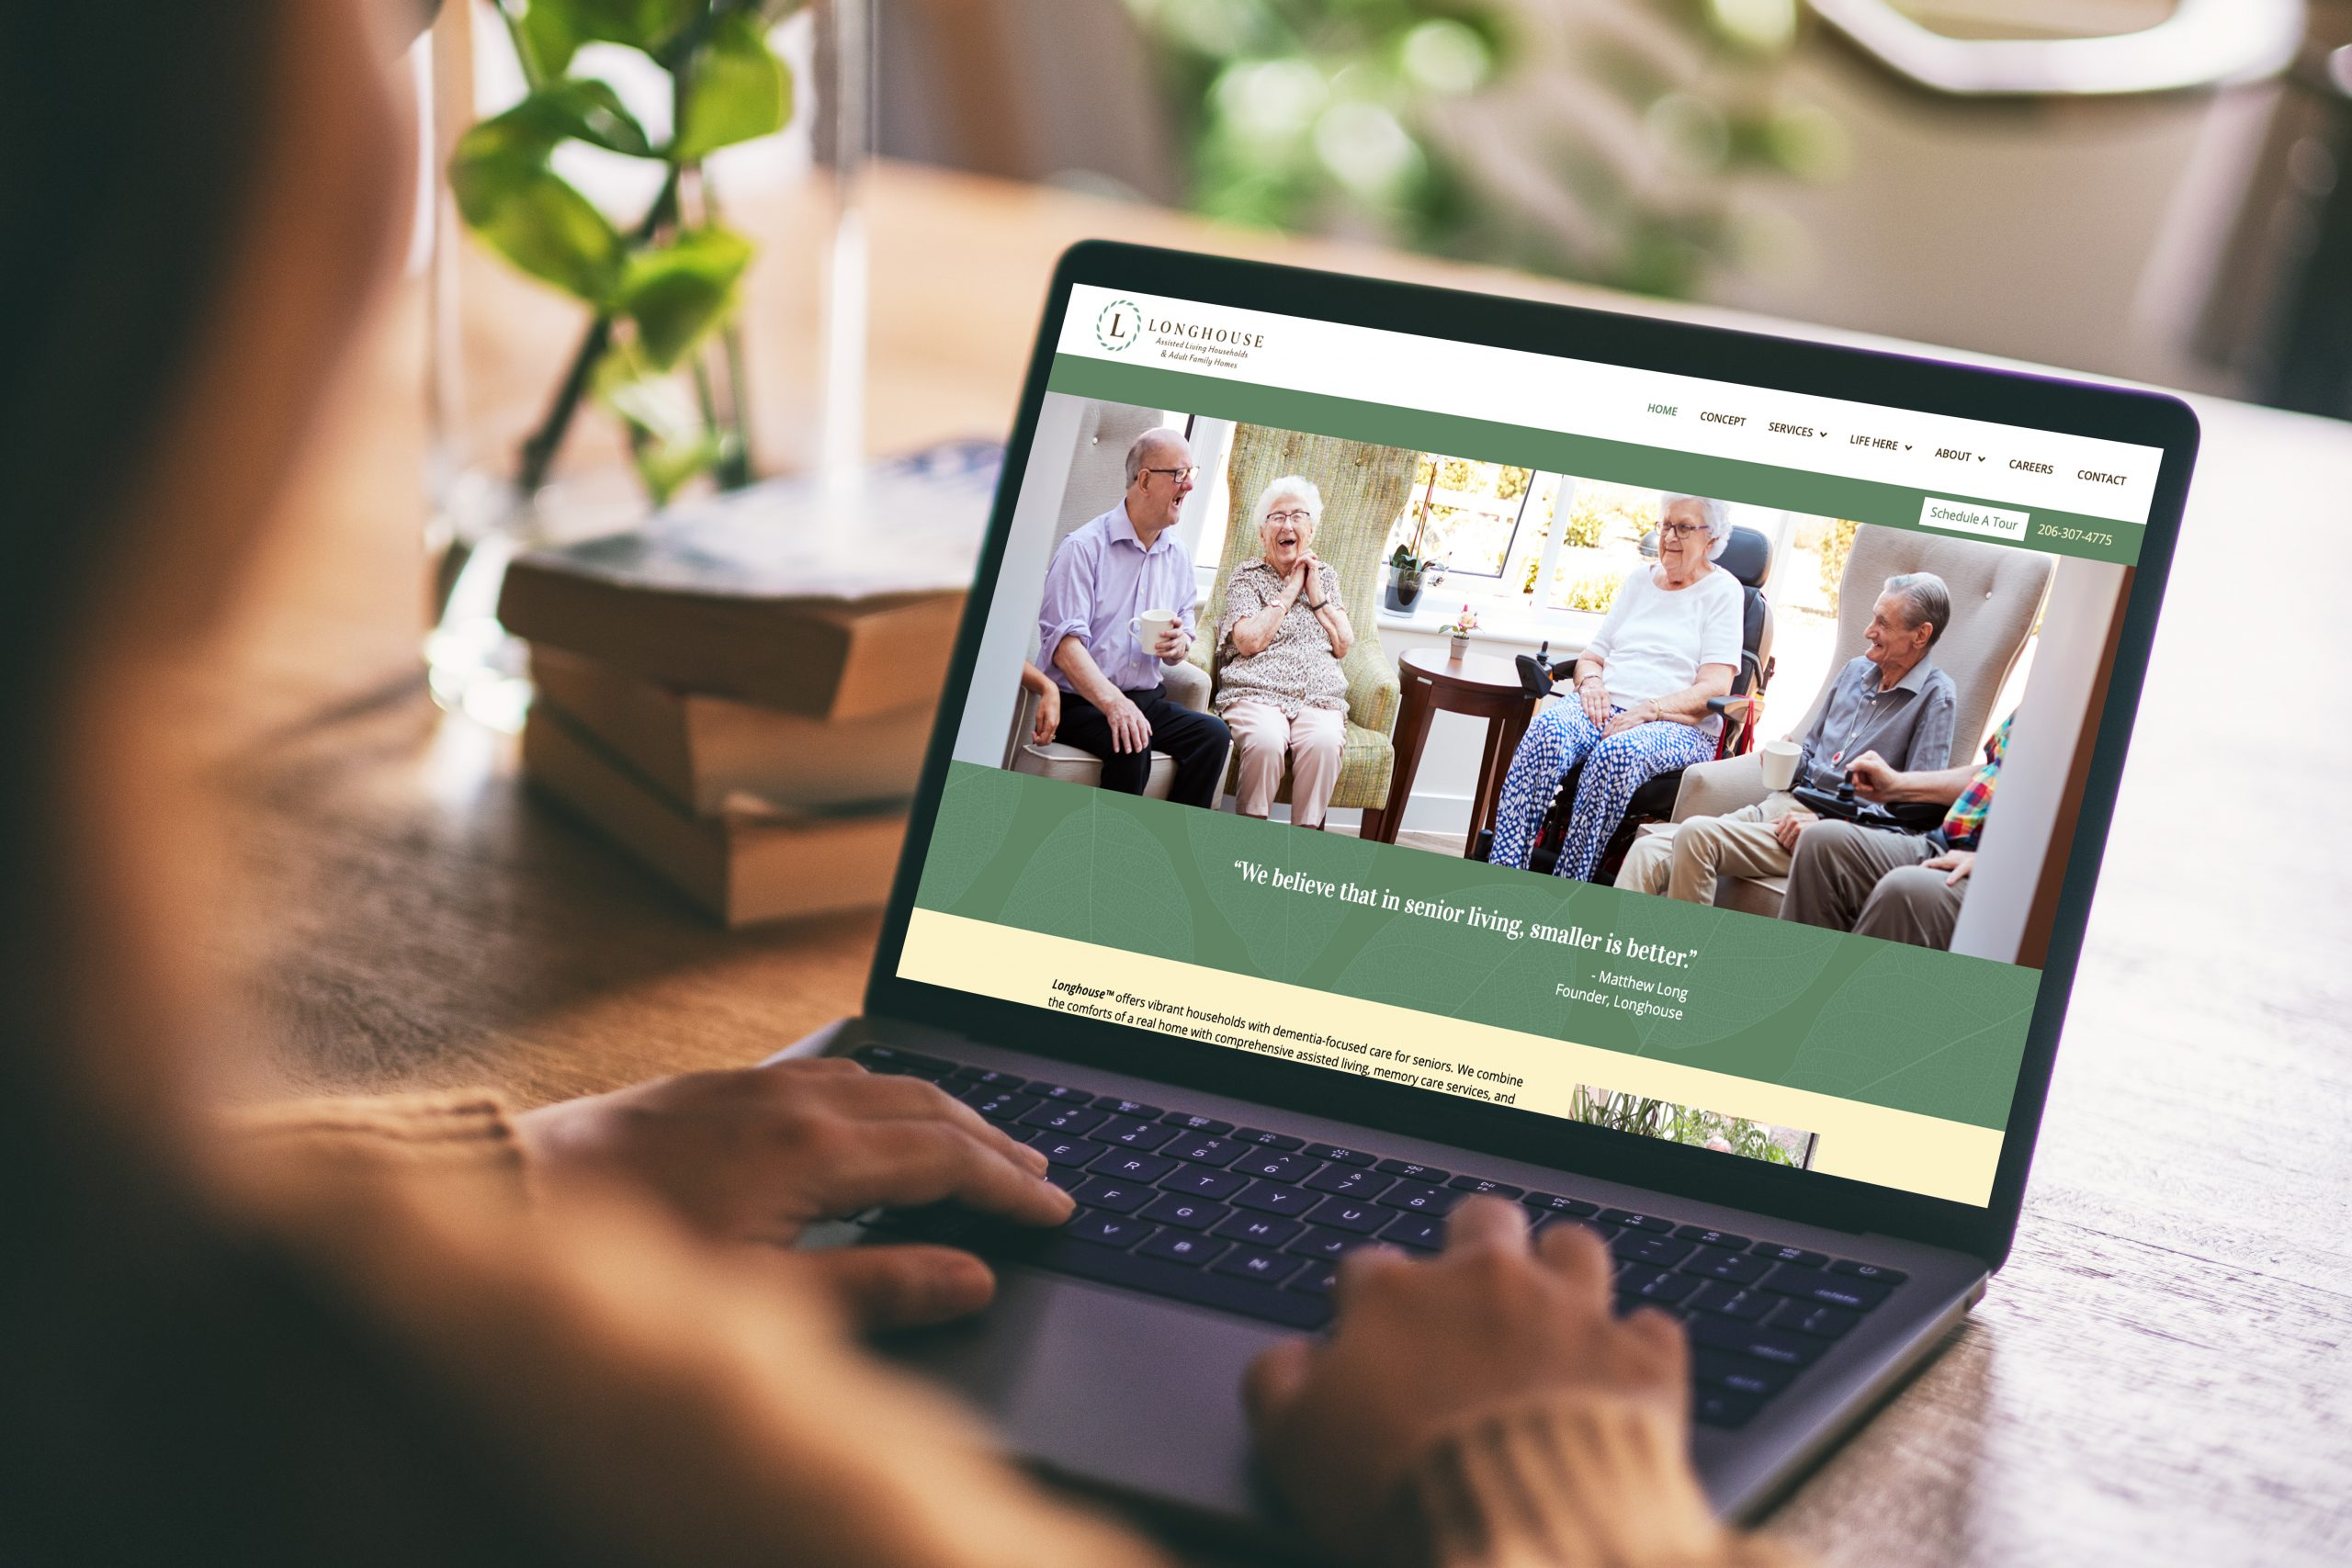 Longhouse website